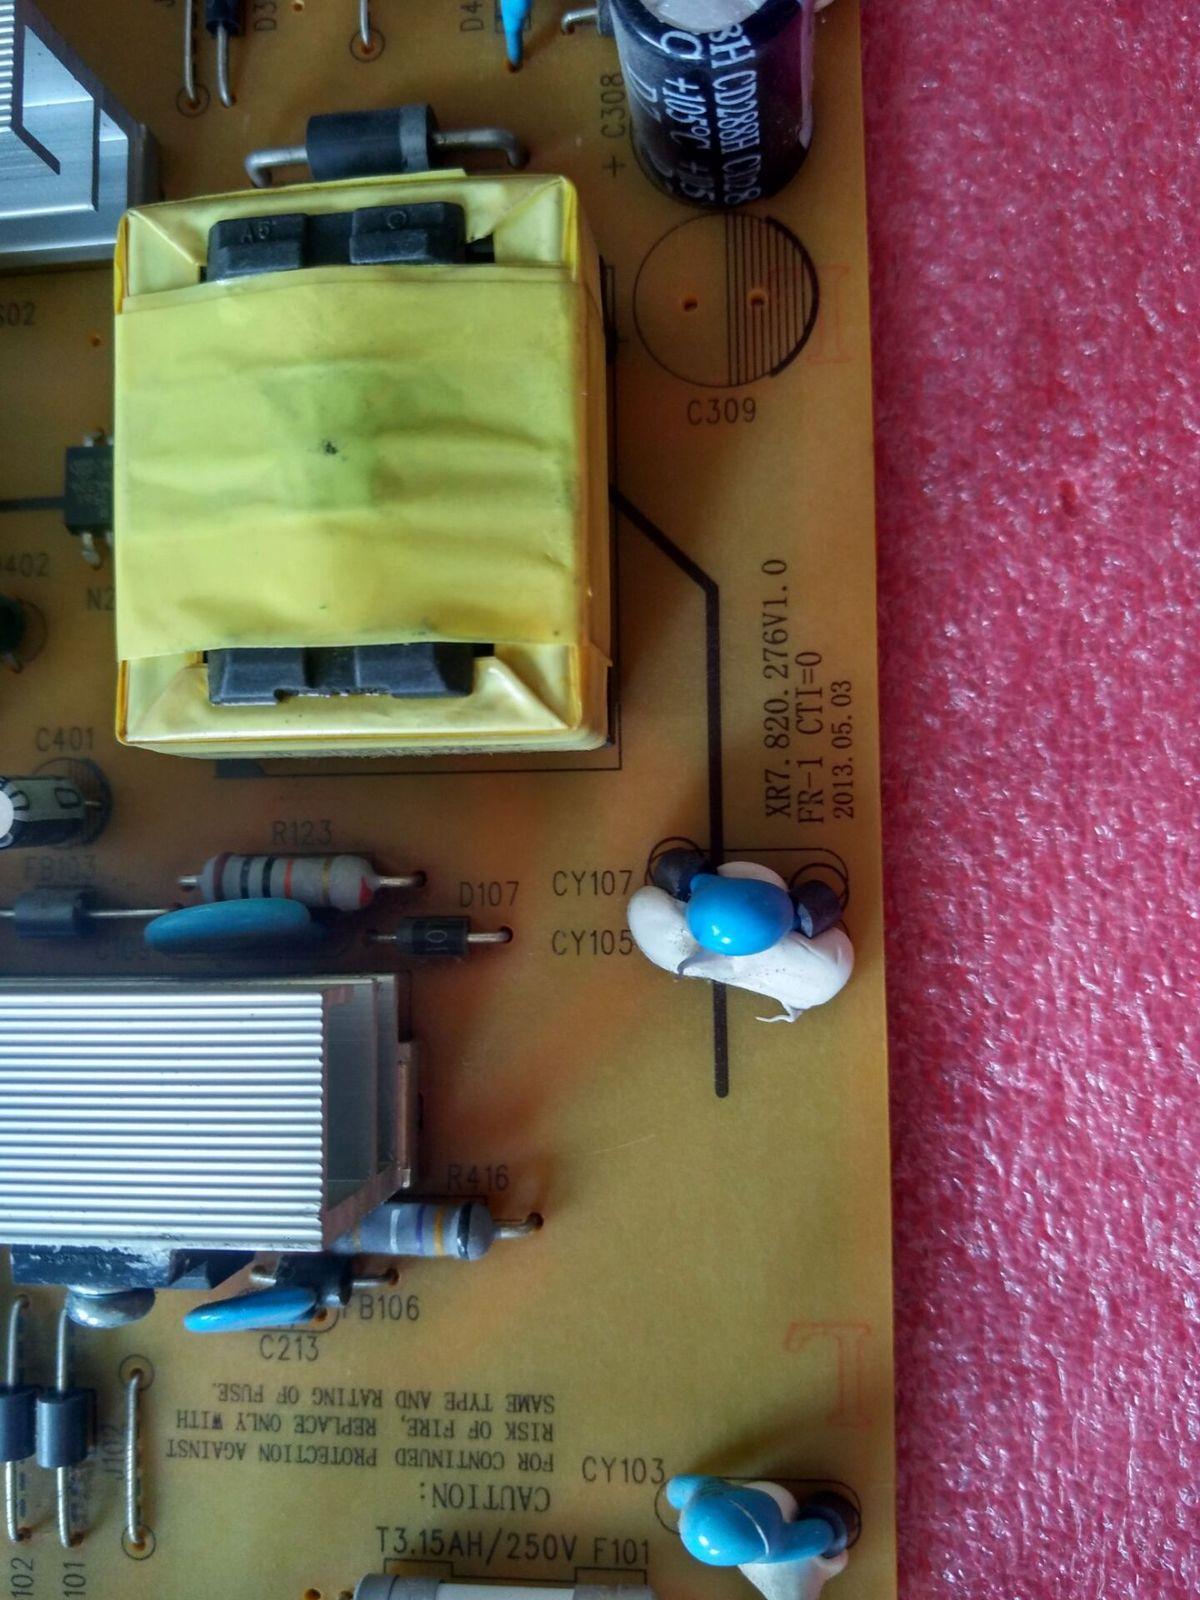 Pin By Cradeal On Hitachi Power Board Power Power Supply Hitachi